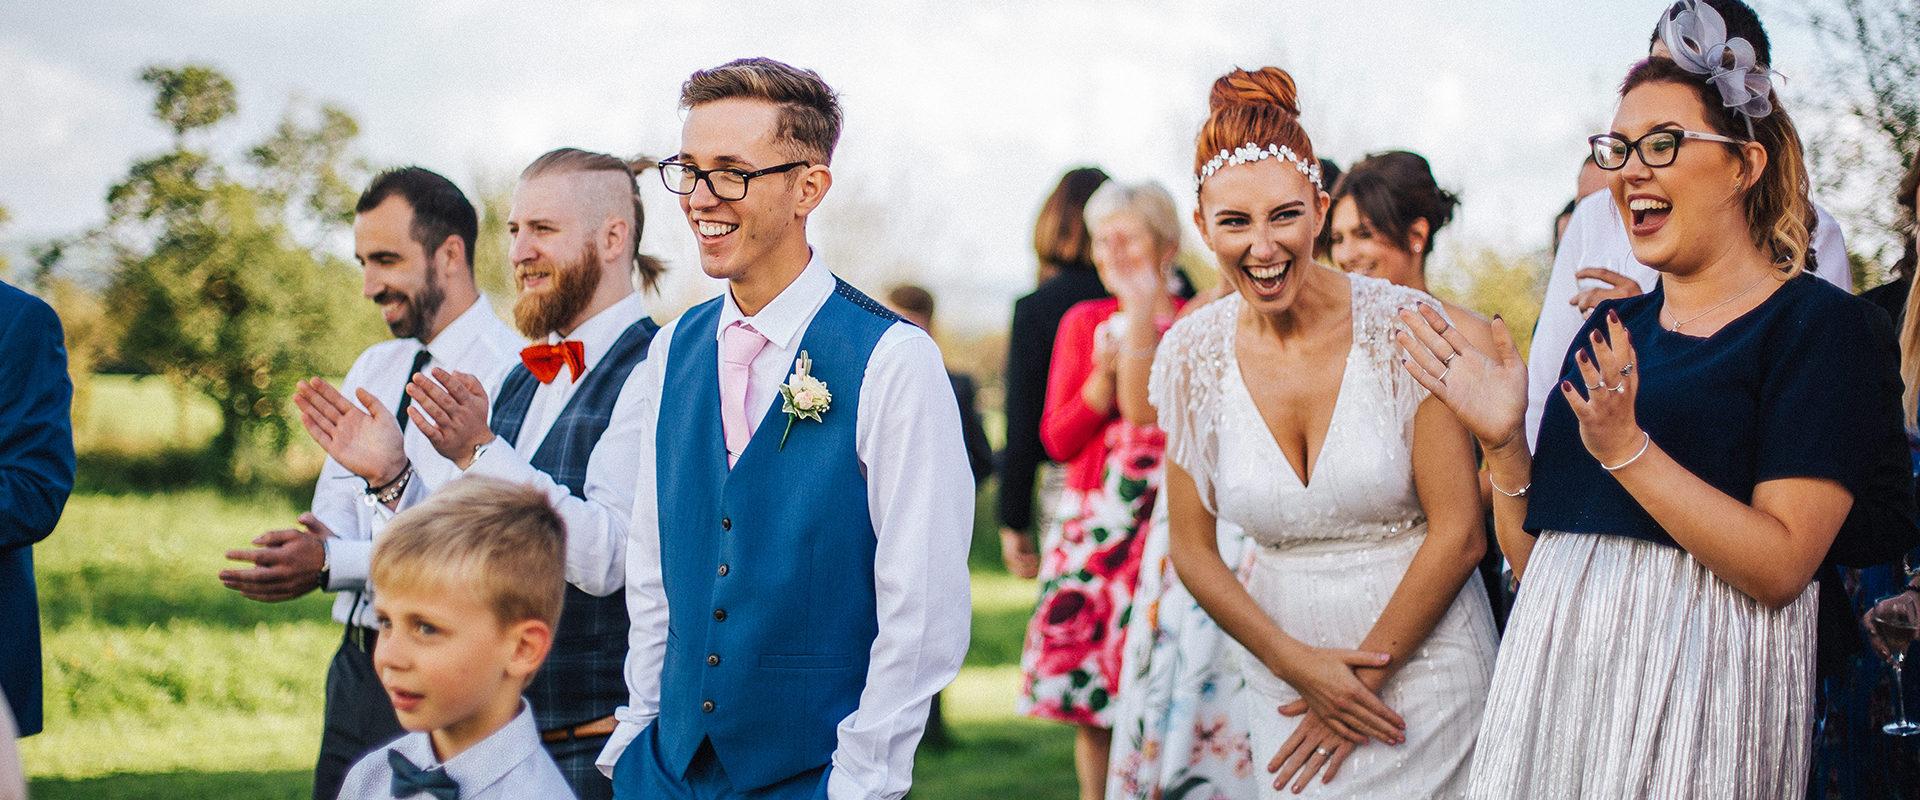 Natural documentary wedding photos Lancashire